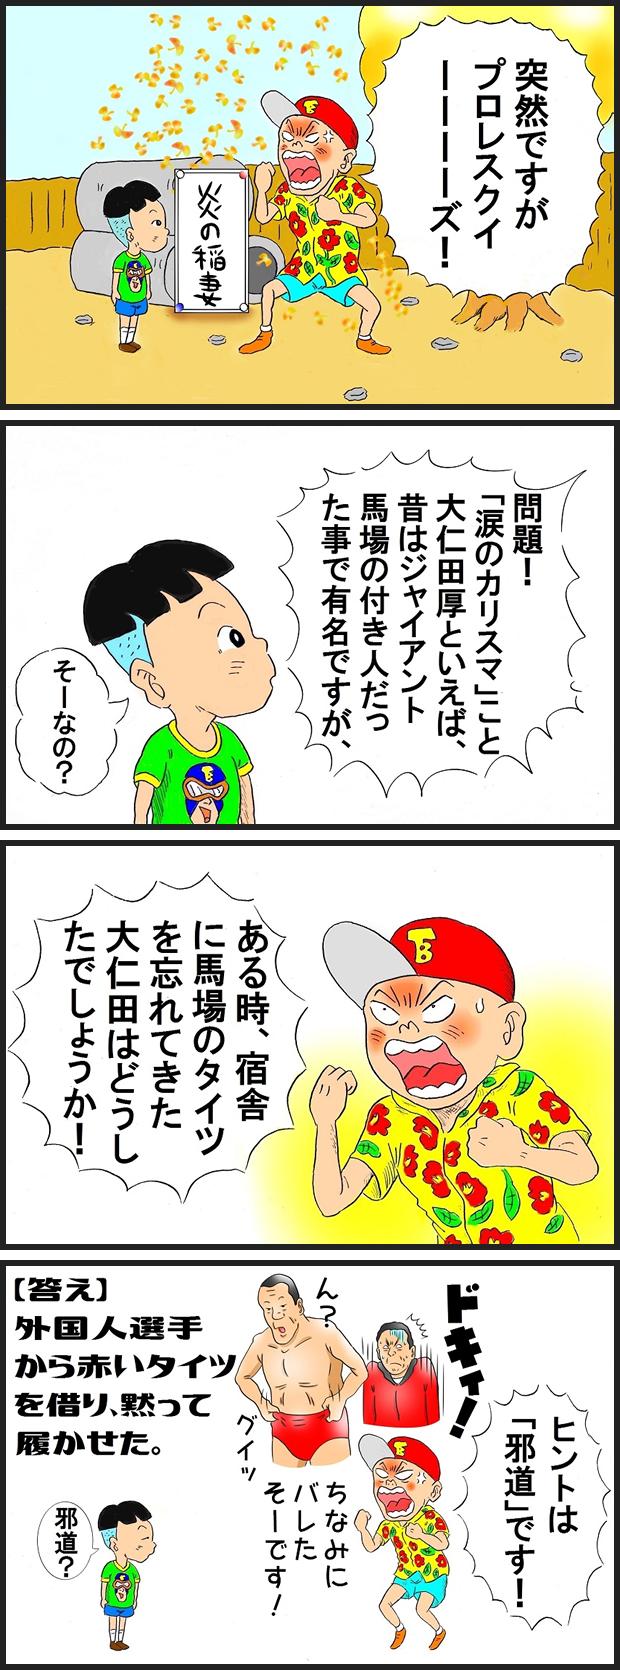 527 馬場と大仁田